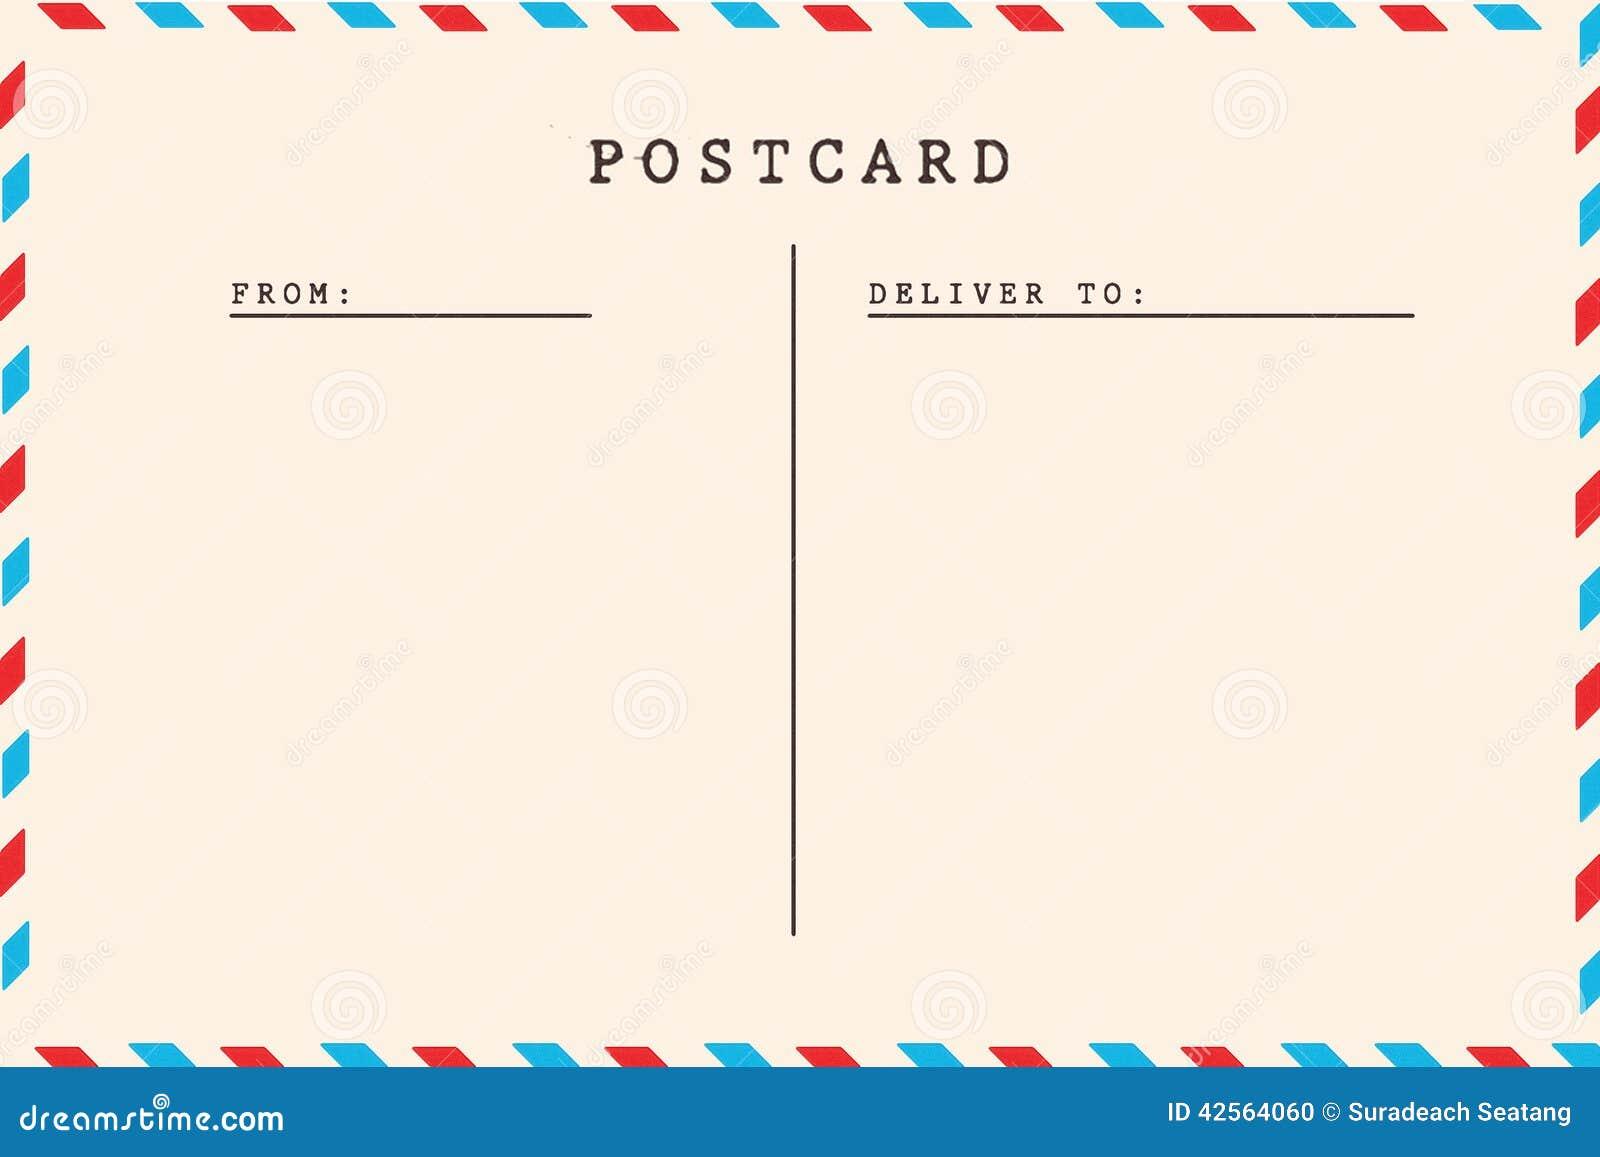 back of postcard - anuvrat.info